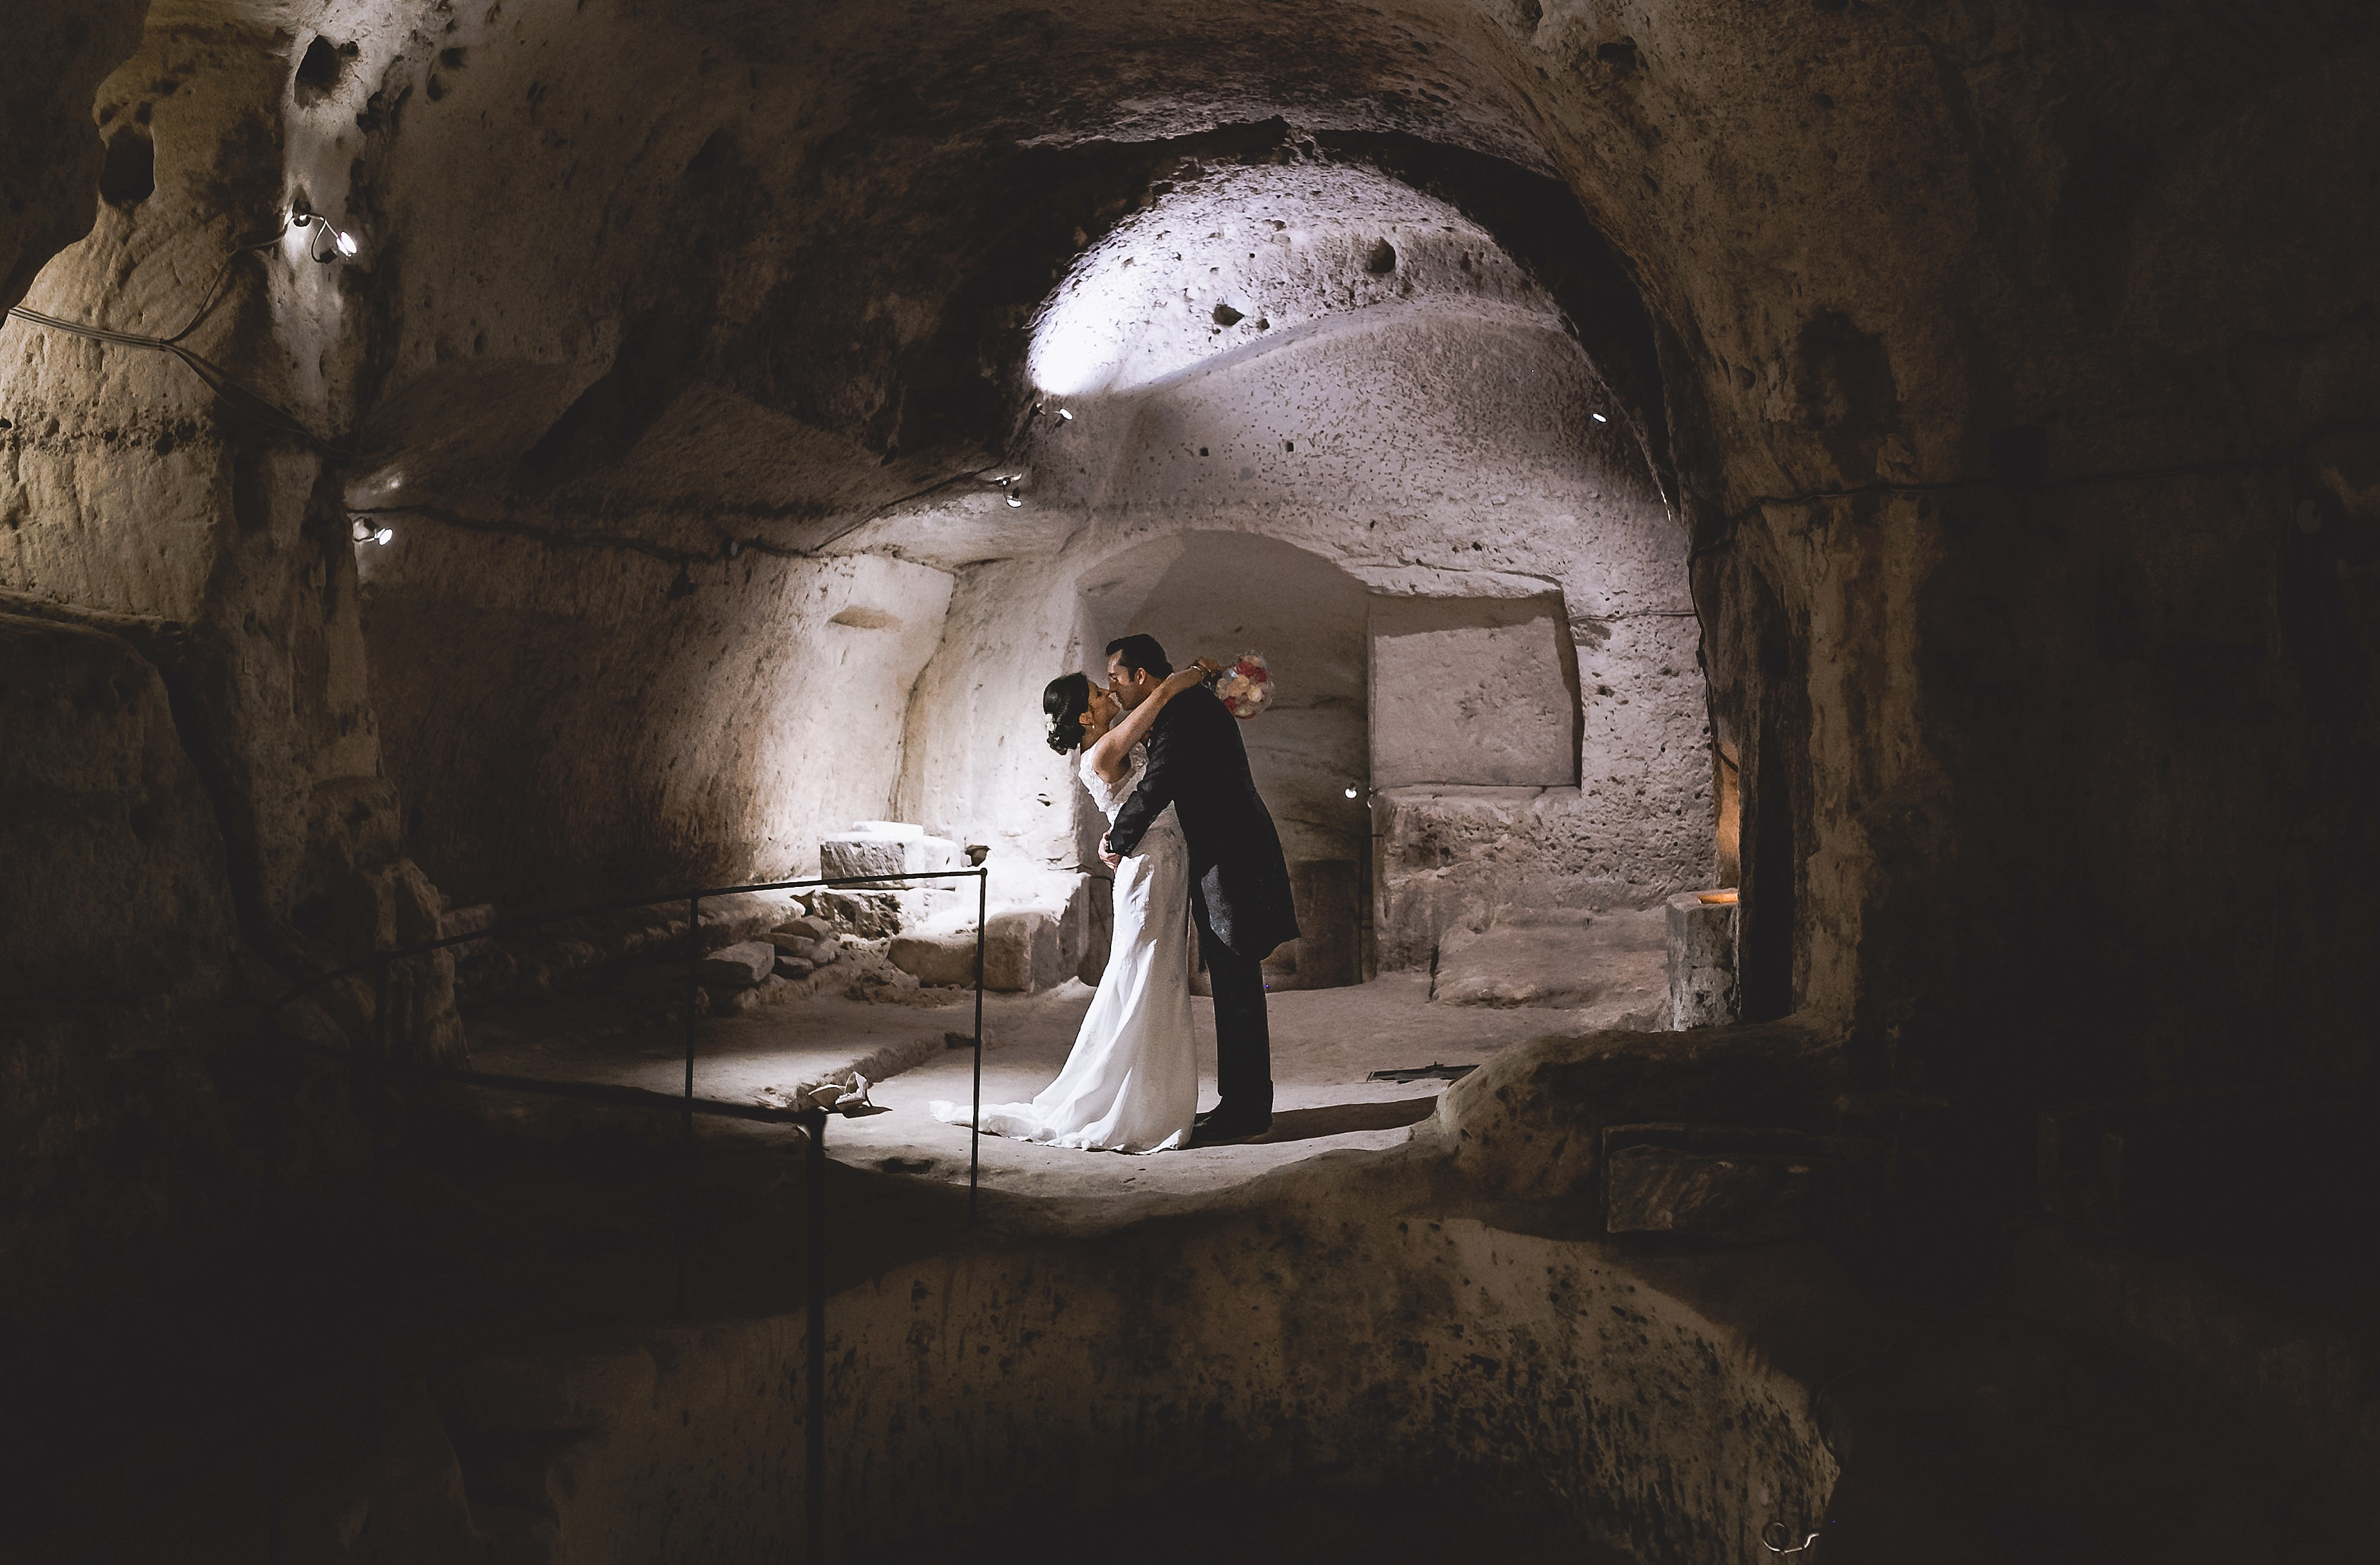 matera wedding photos by beatrici photography - matera cave wedding photos